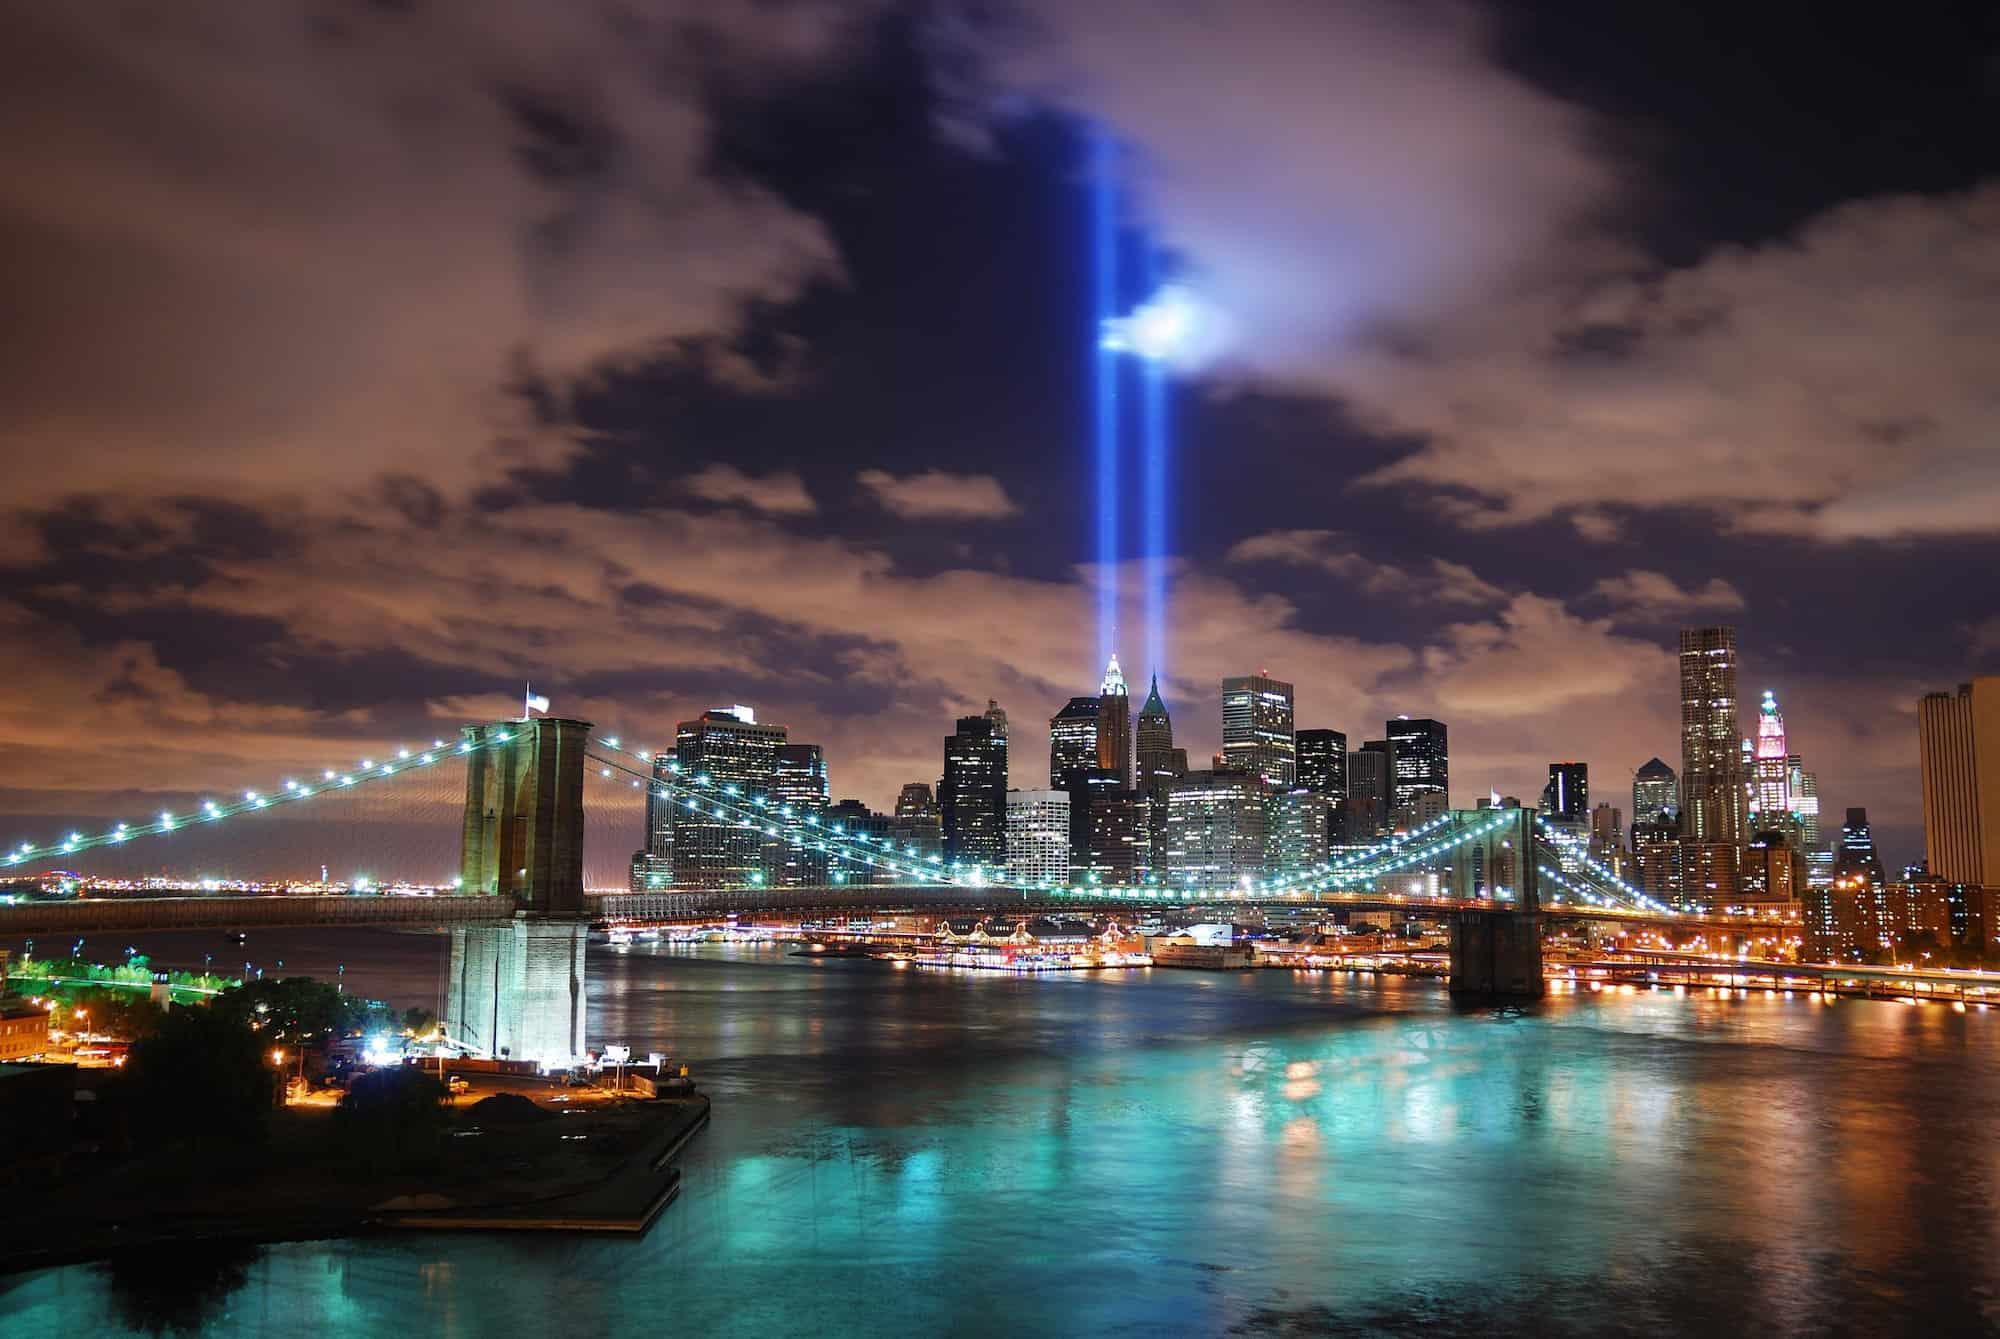 The 20 Year Anniversary of 9/11